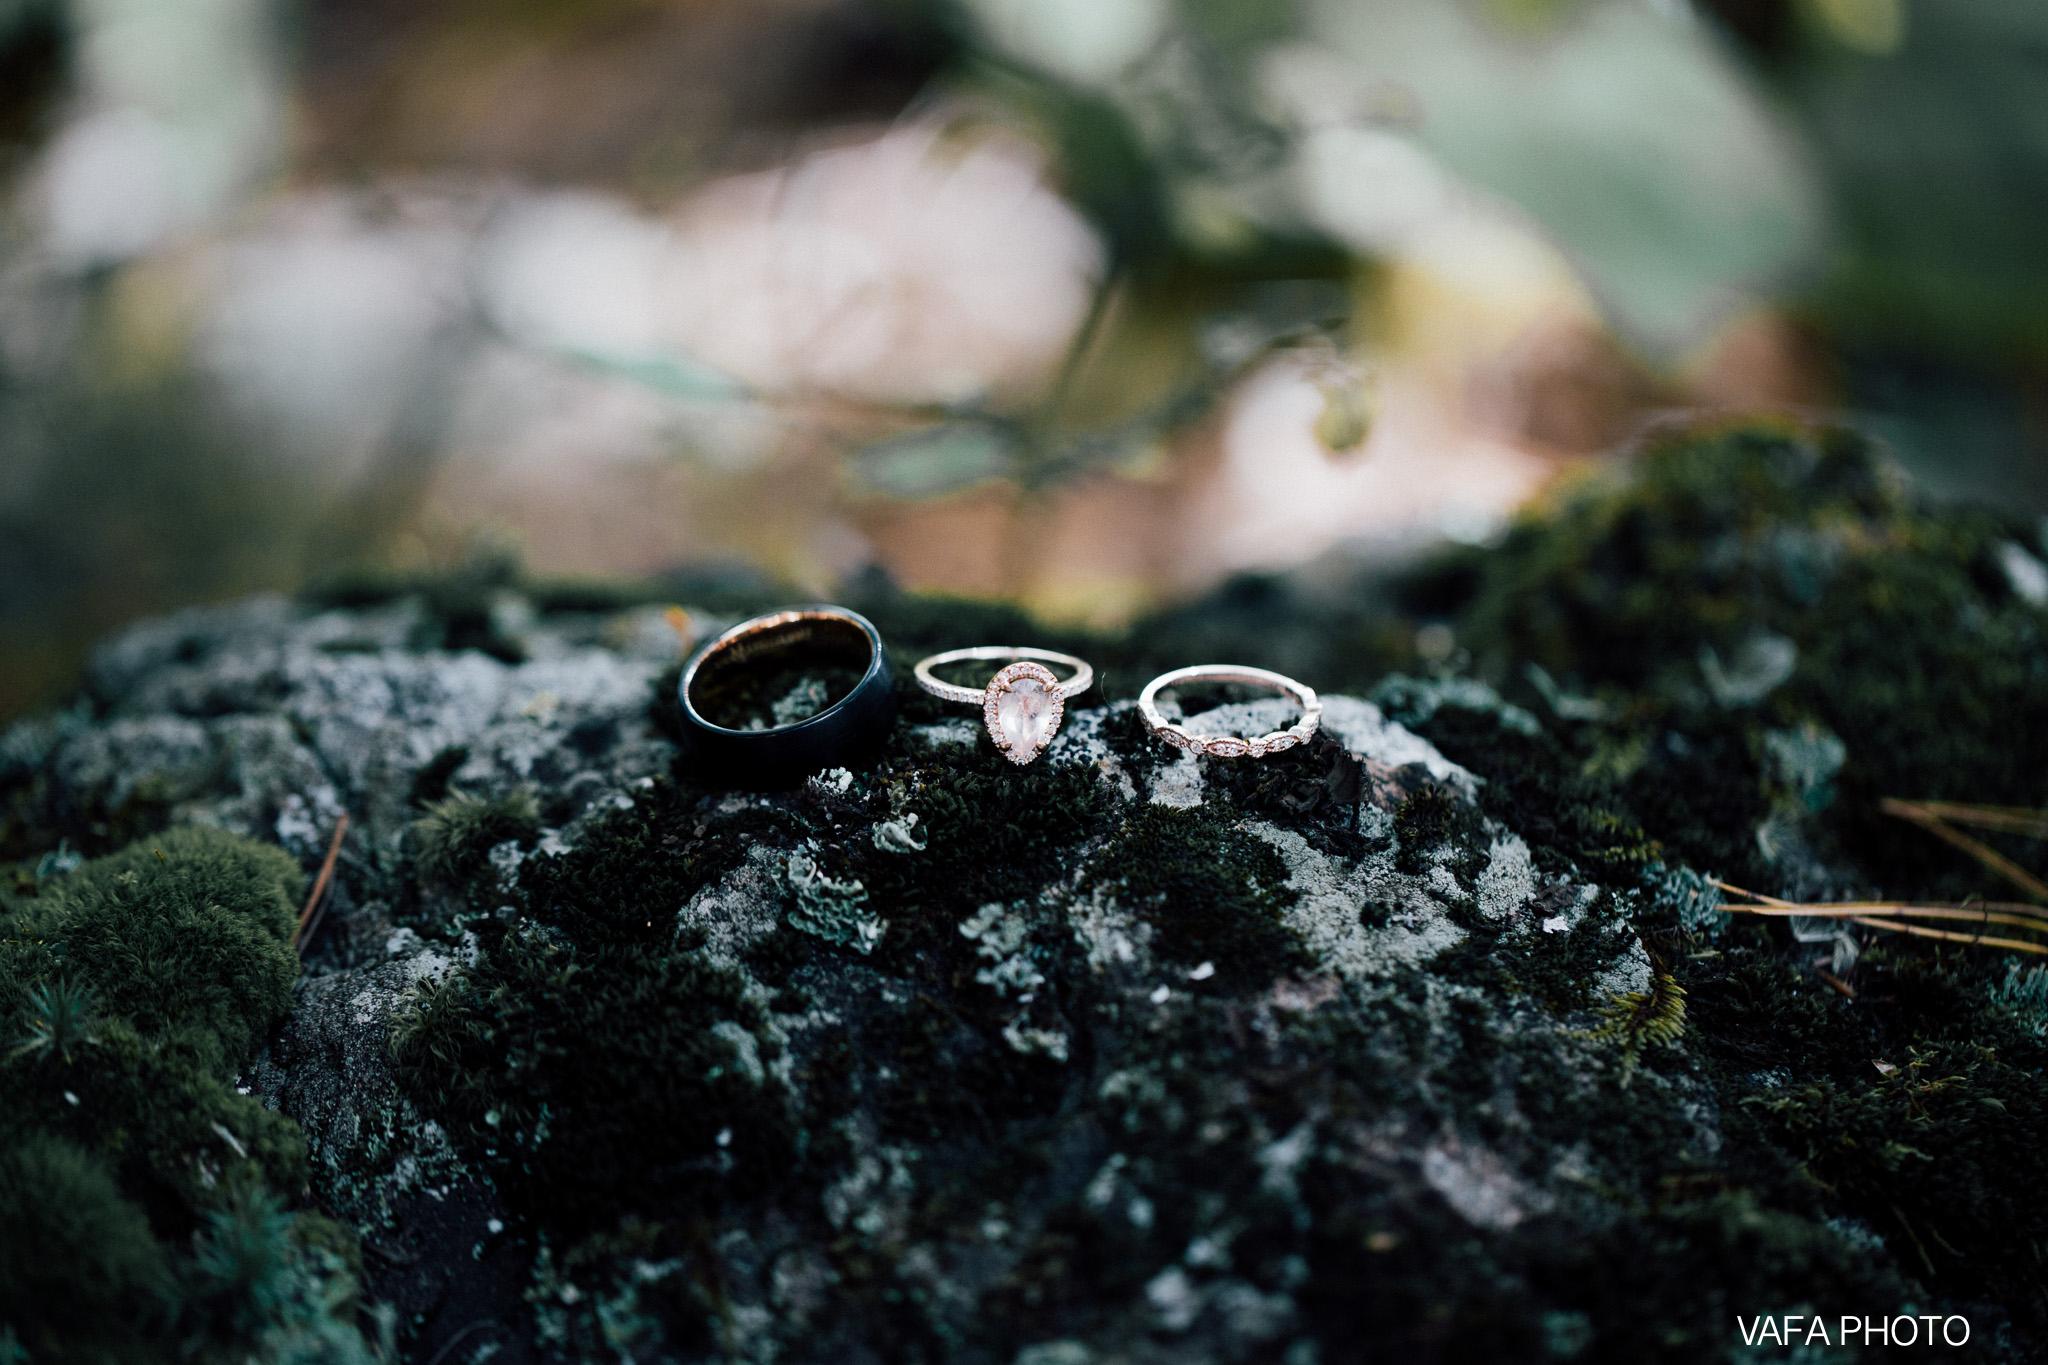 Hogback-Mountain-Wedding-Chelsea-Josh-Vafa-Photo-50.jpg